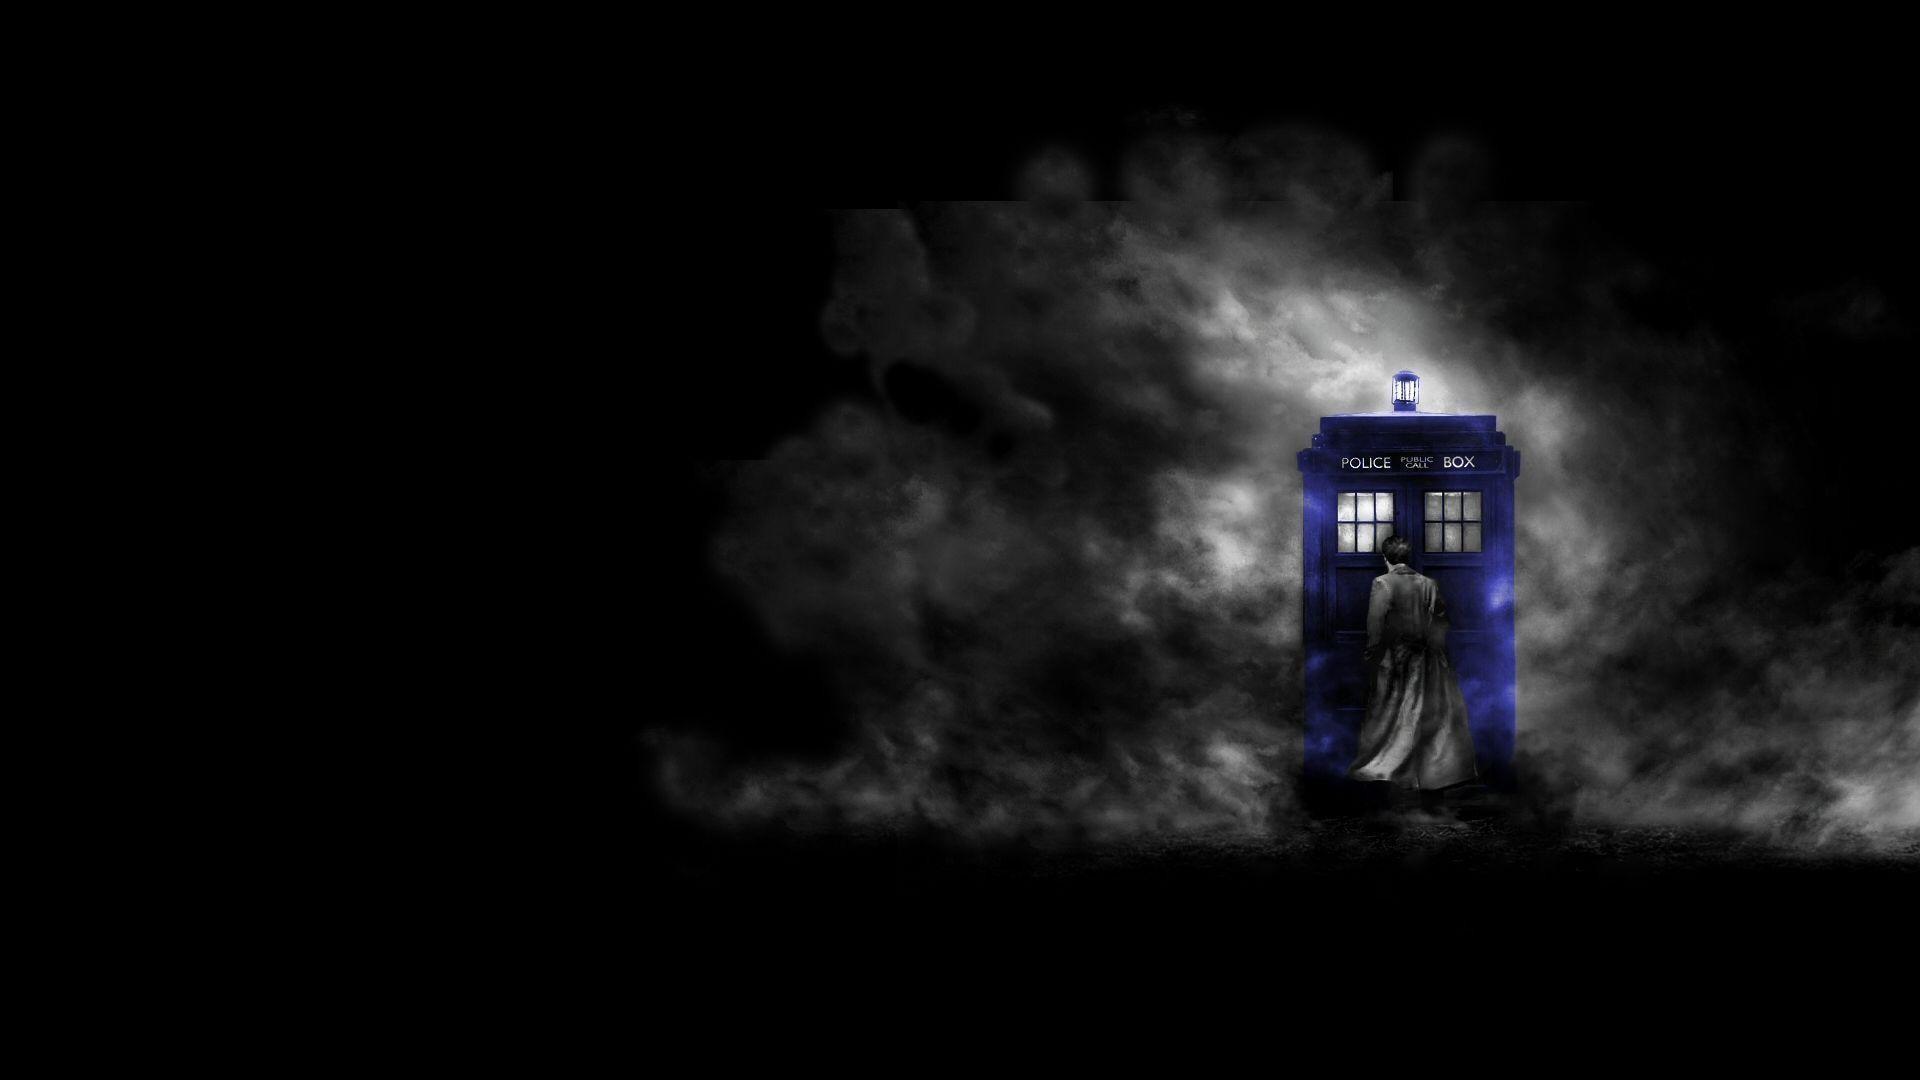 Doctor Who Hd Wallpaper Panda 1920x1080PX ~ Wallpaper Doctor Who .